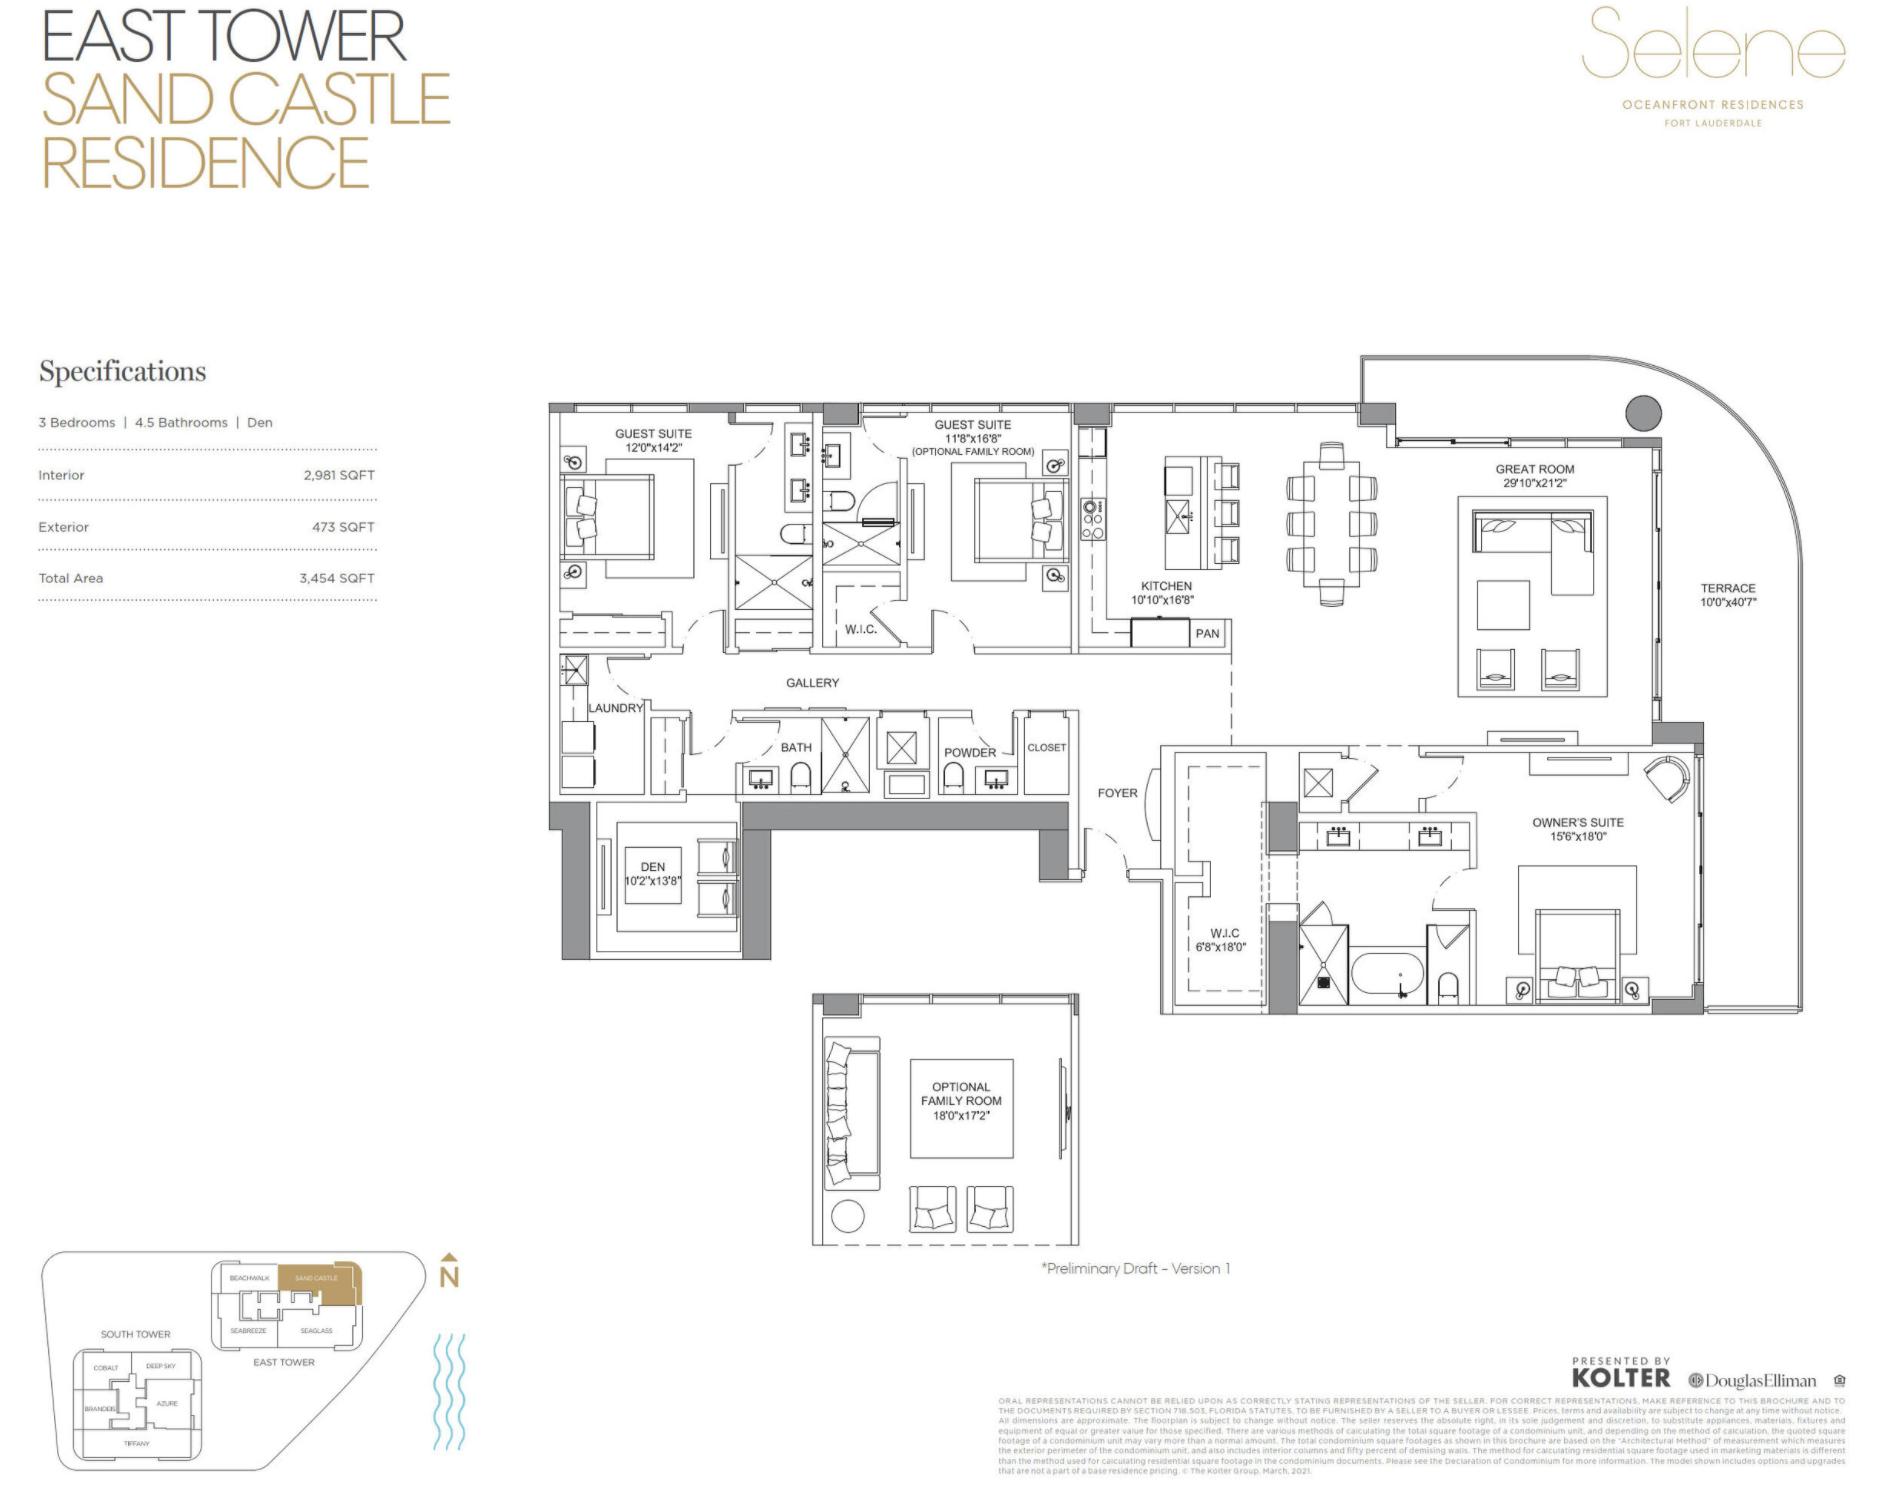 East Tower | Sand Castle| 3 Be / Den | 4.5 Ba